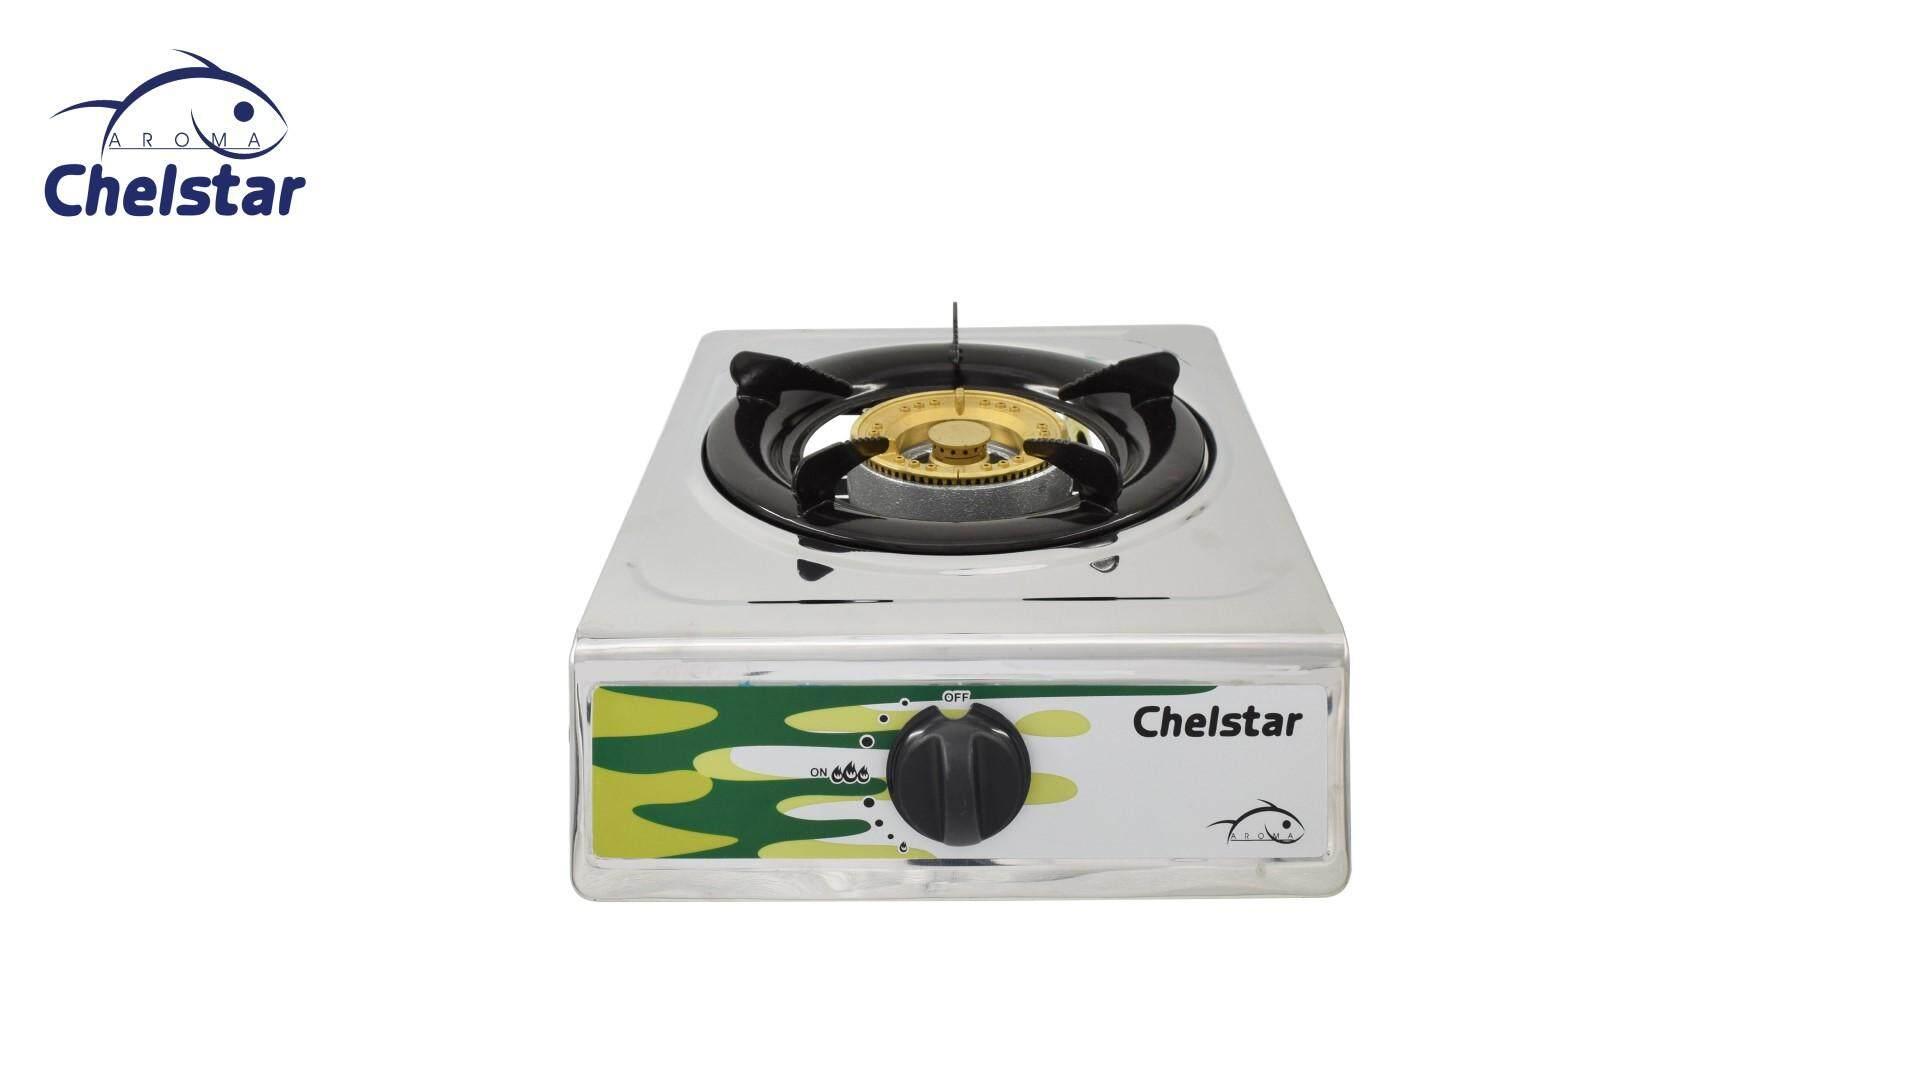 Chelstar Stainless Steel Table Top Single Burner Stove / Gas Cooker (SE-10)